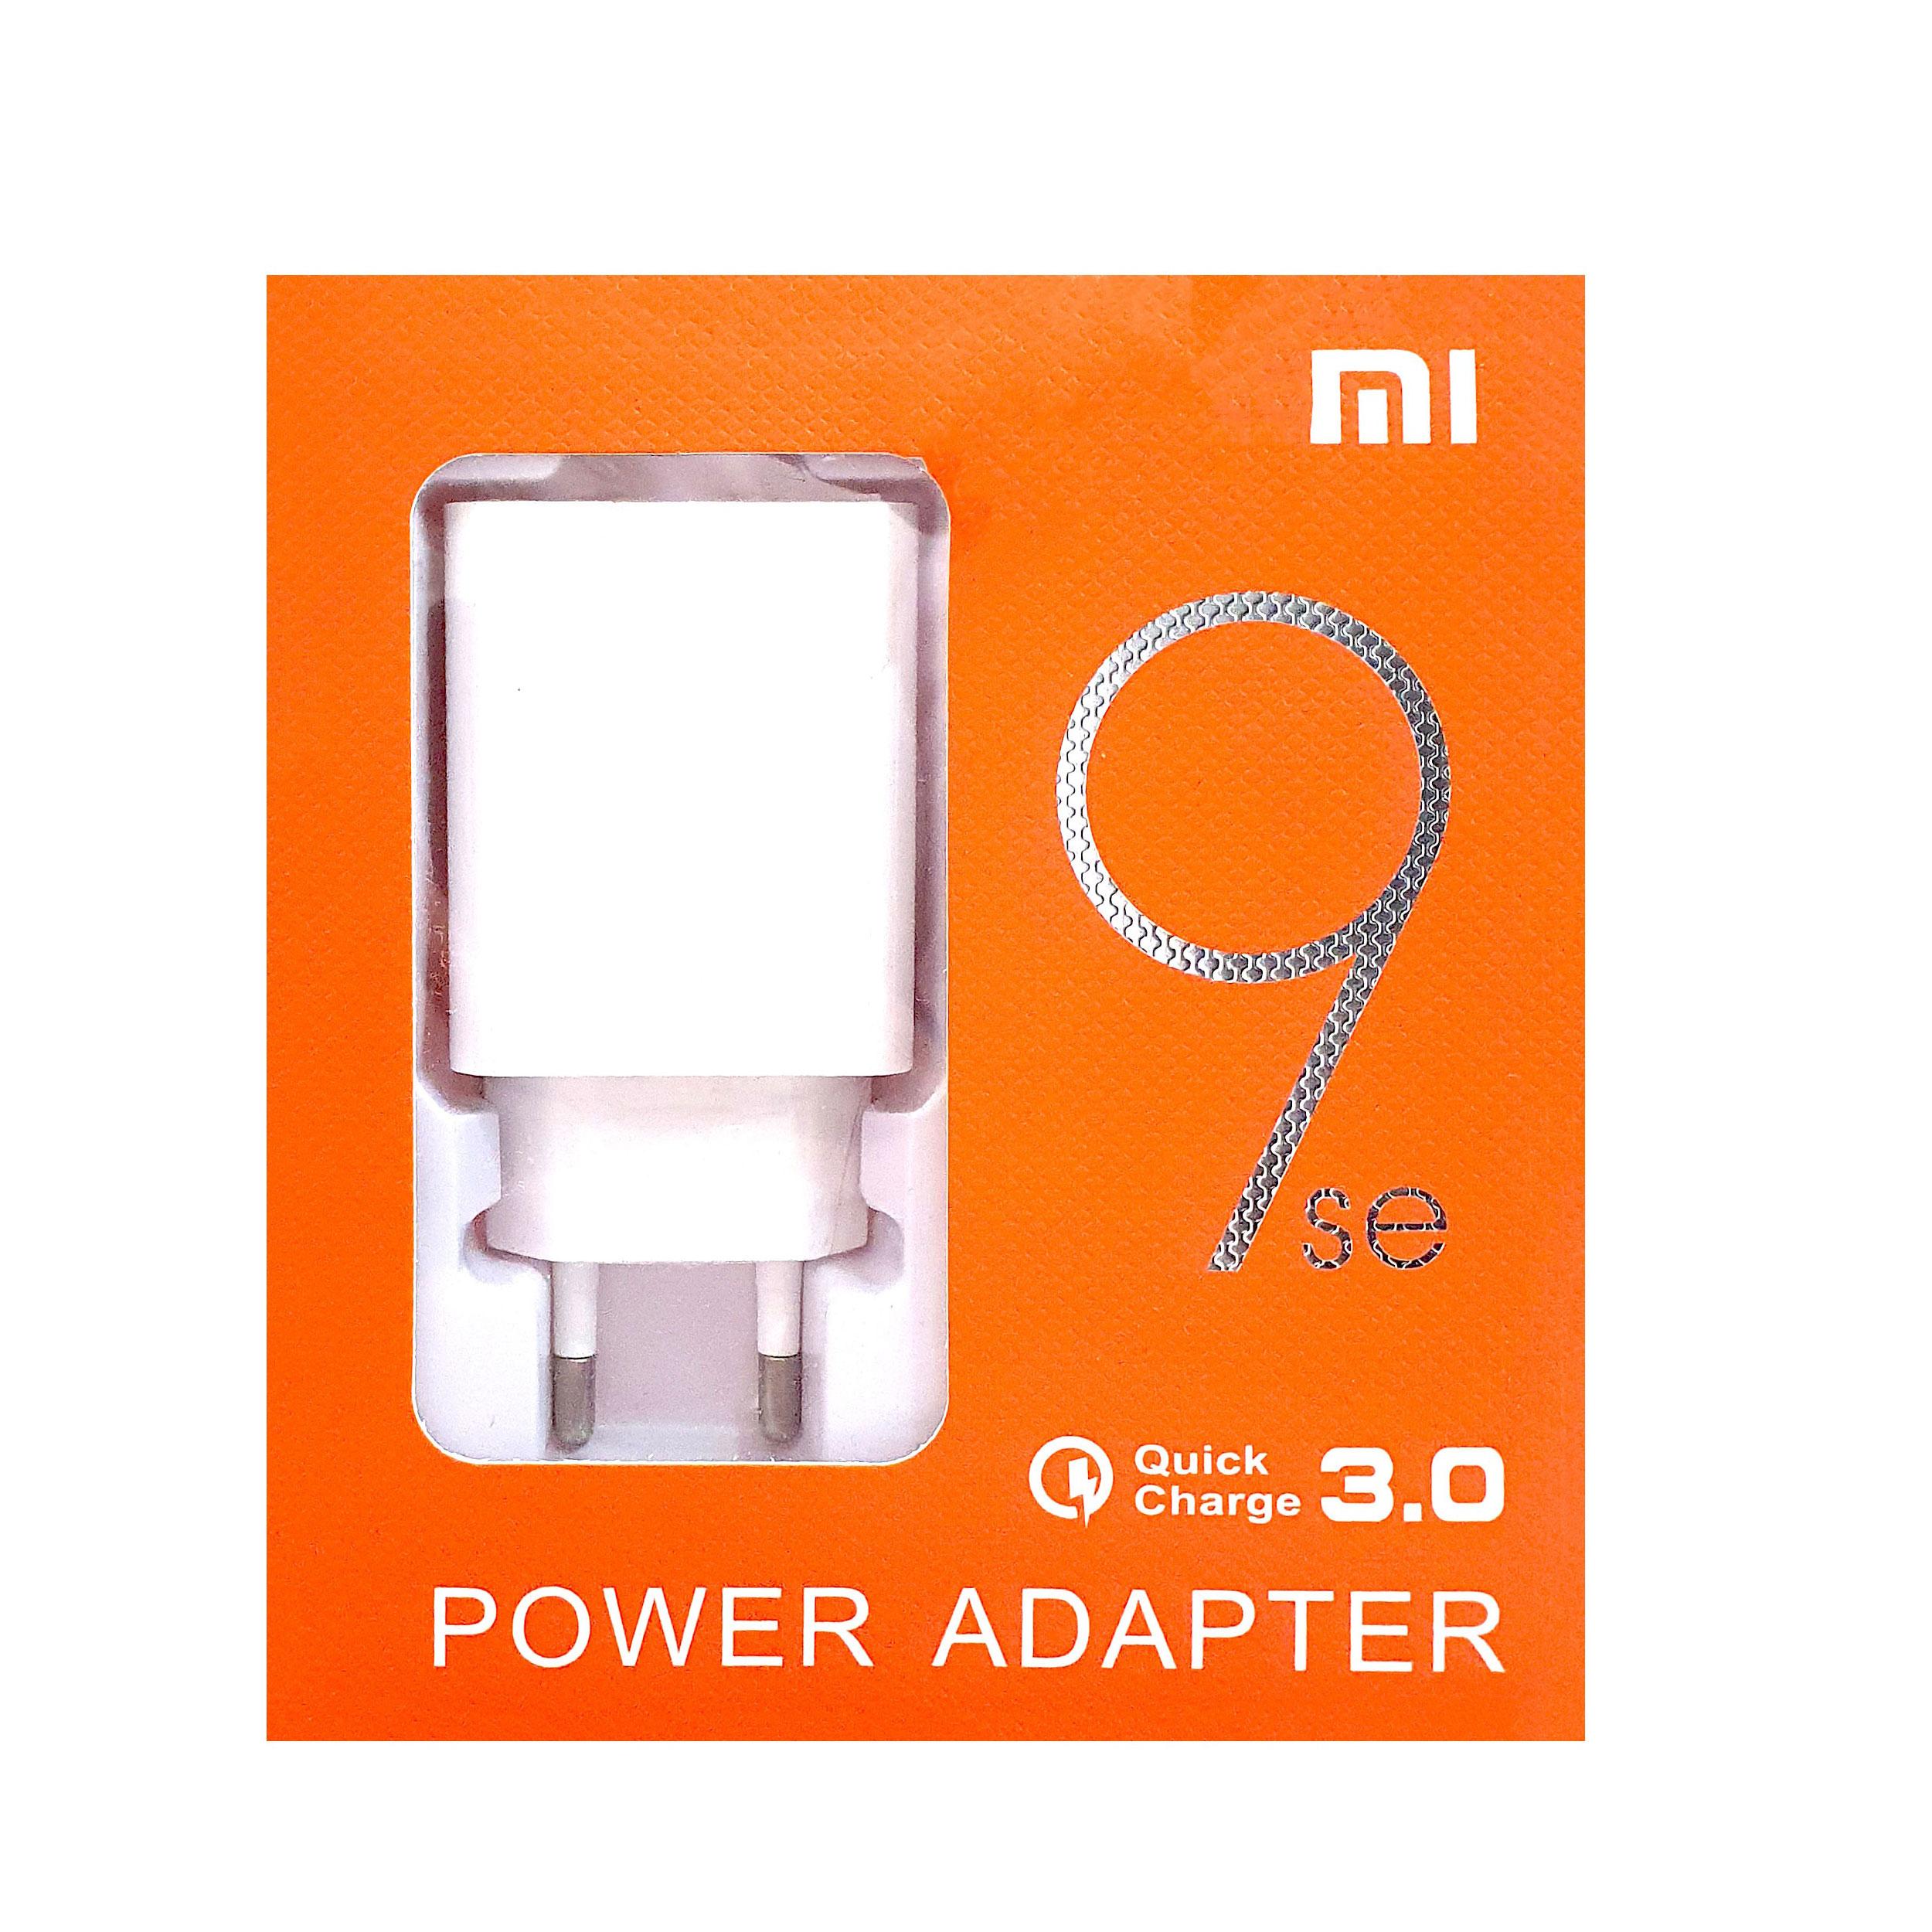 شارژر دیواری شیائومی مدل MDY-10EW به همراه کابل تبدیل USB-C main 1 1